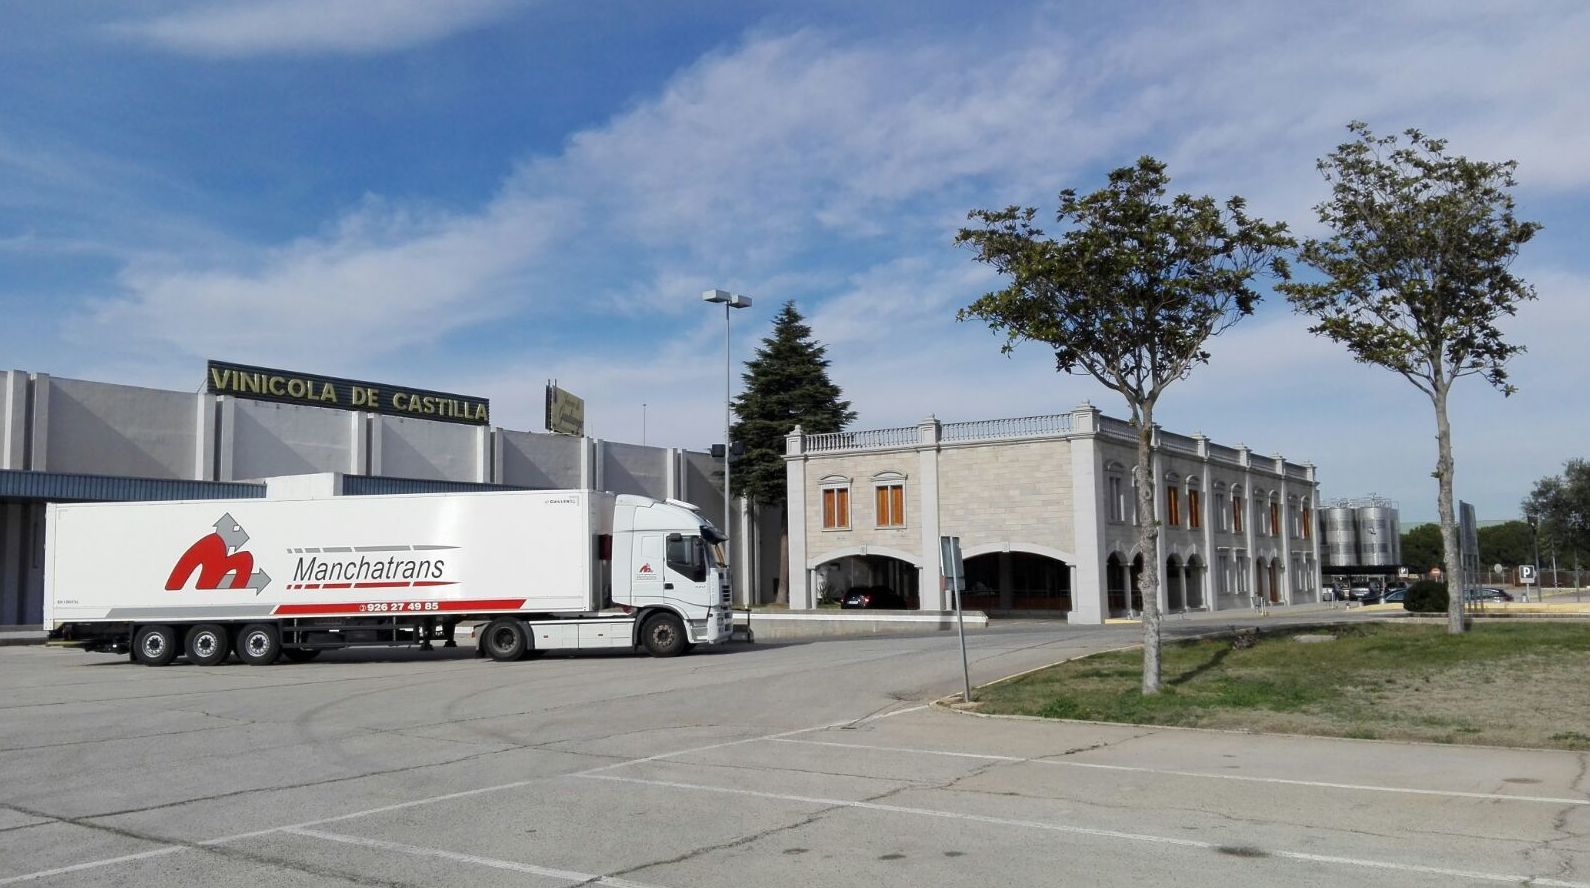 Transporte nacional: Servicios de Manchatrans